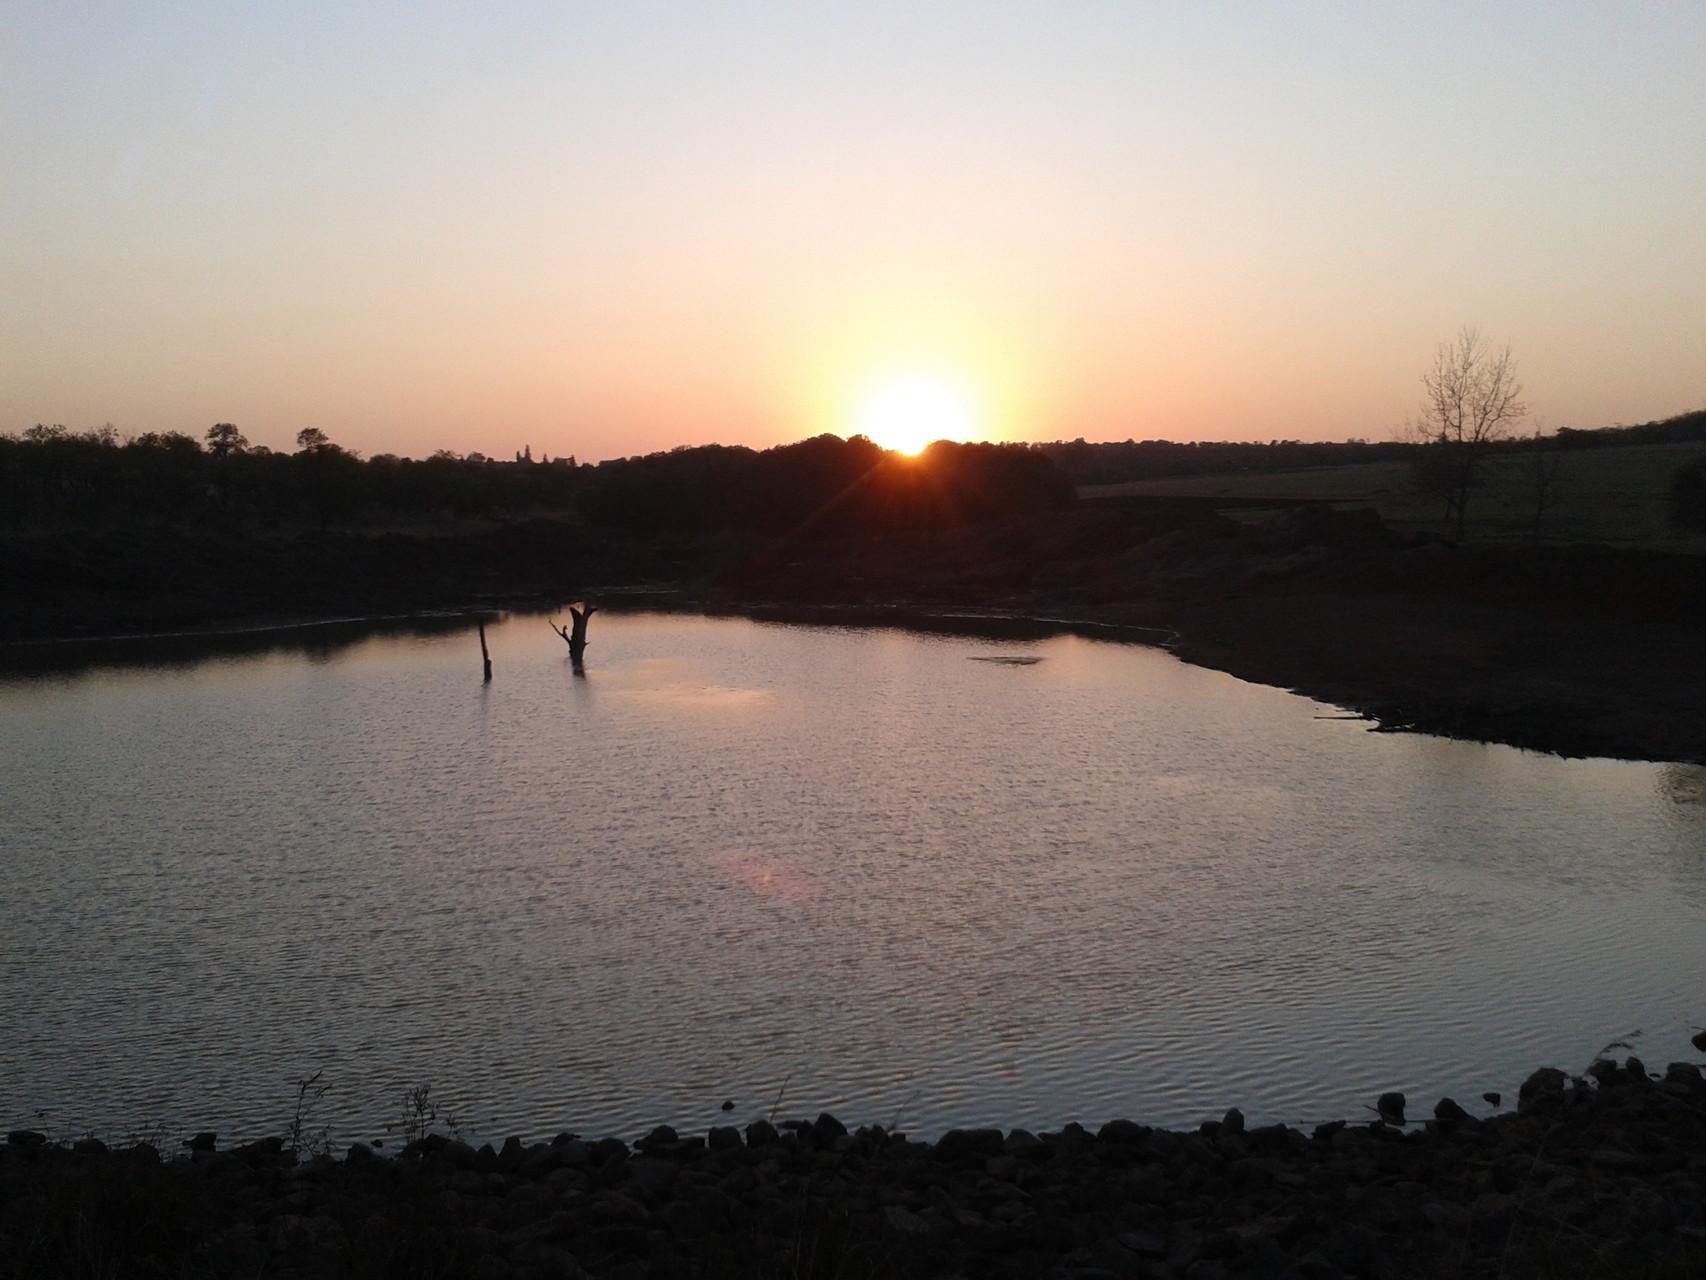 Running into Sunset *-*